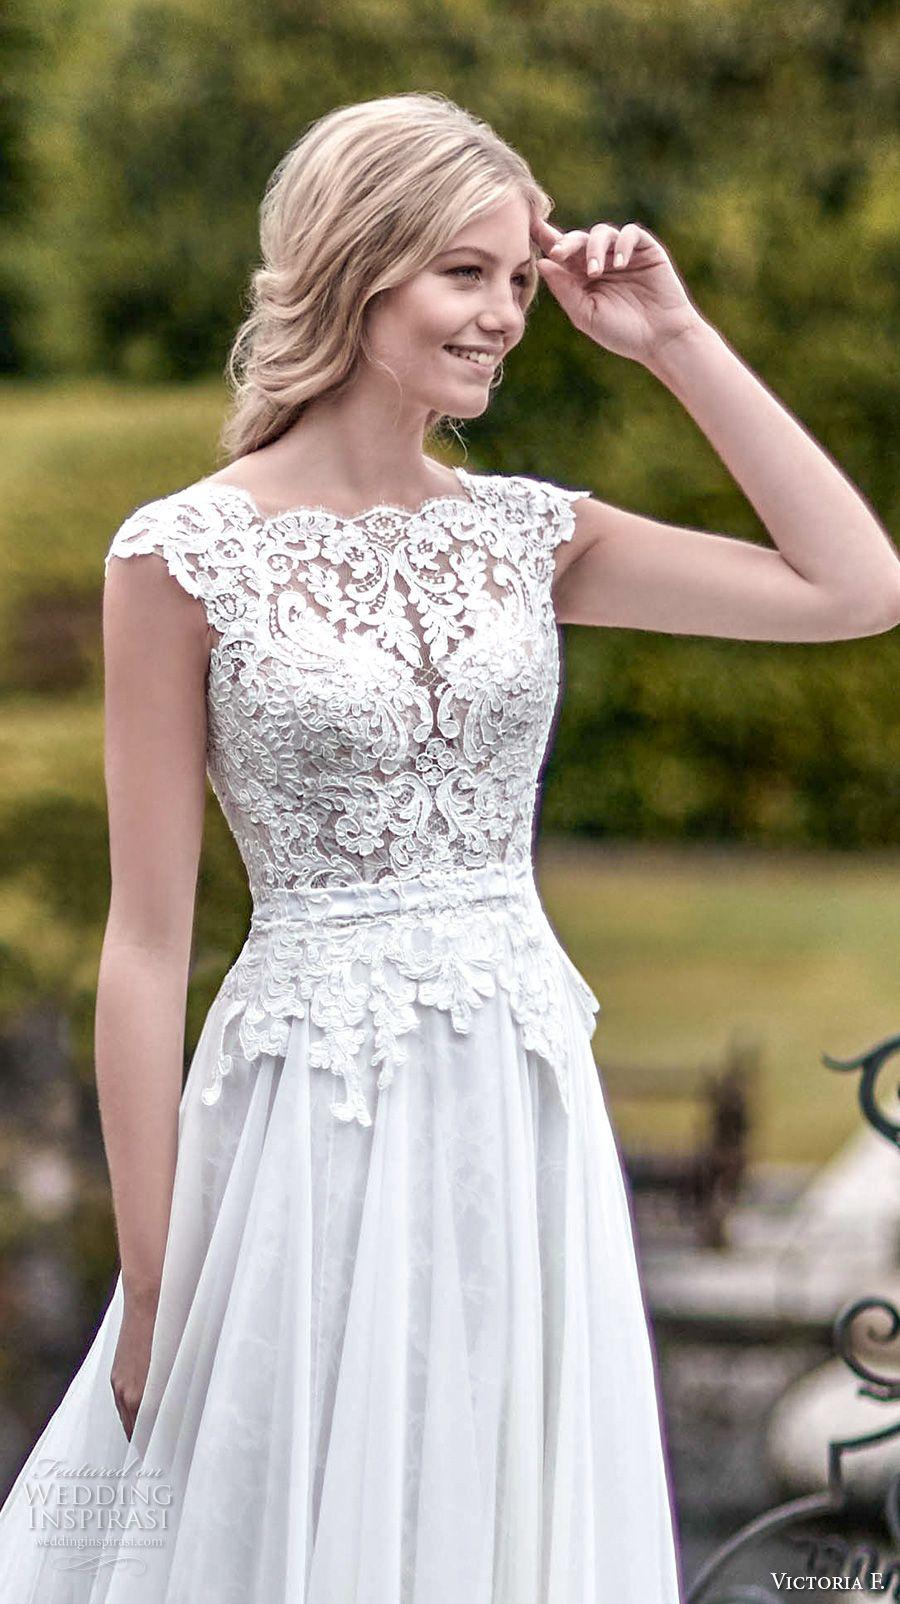 Maison signore wedding dresses scalloped lace chapel train